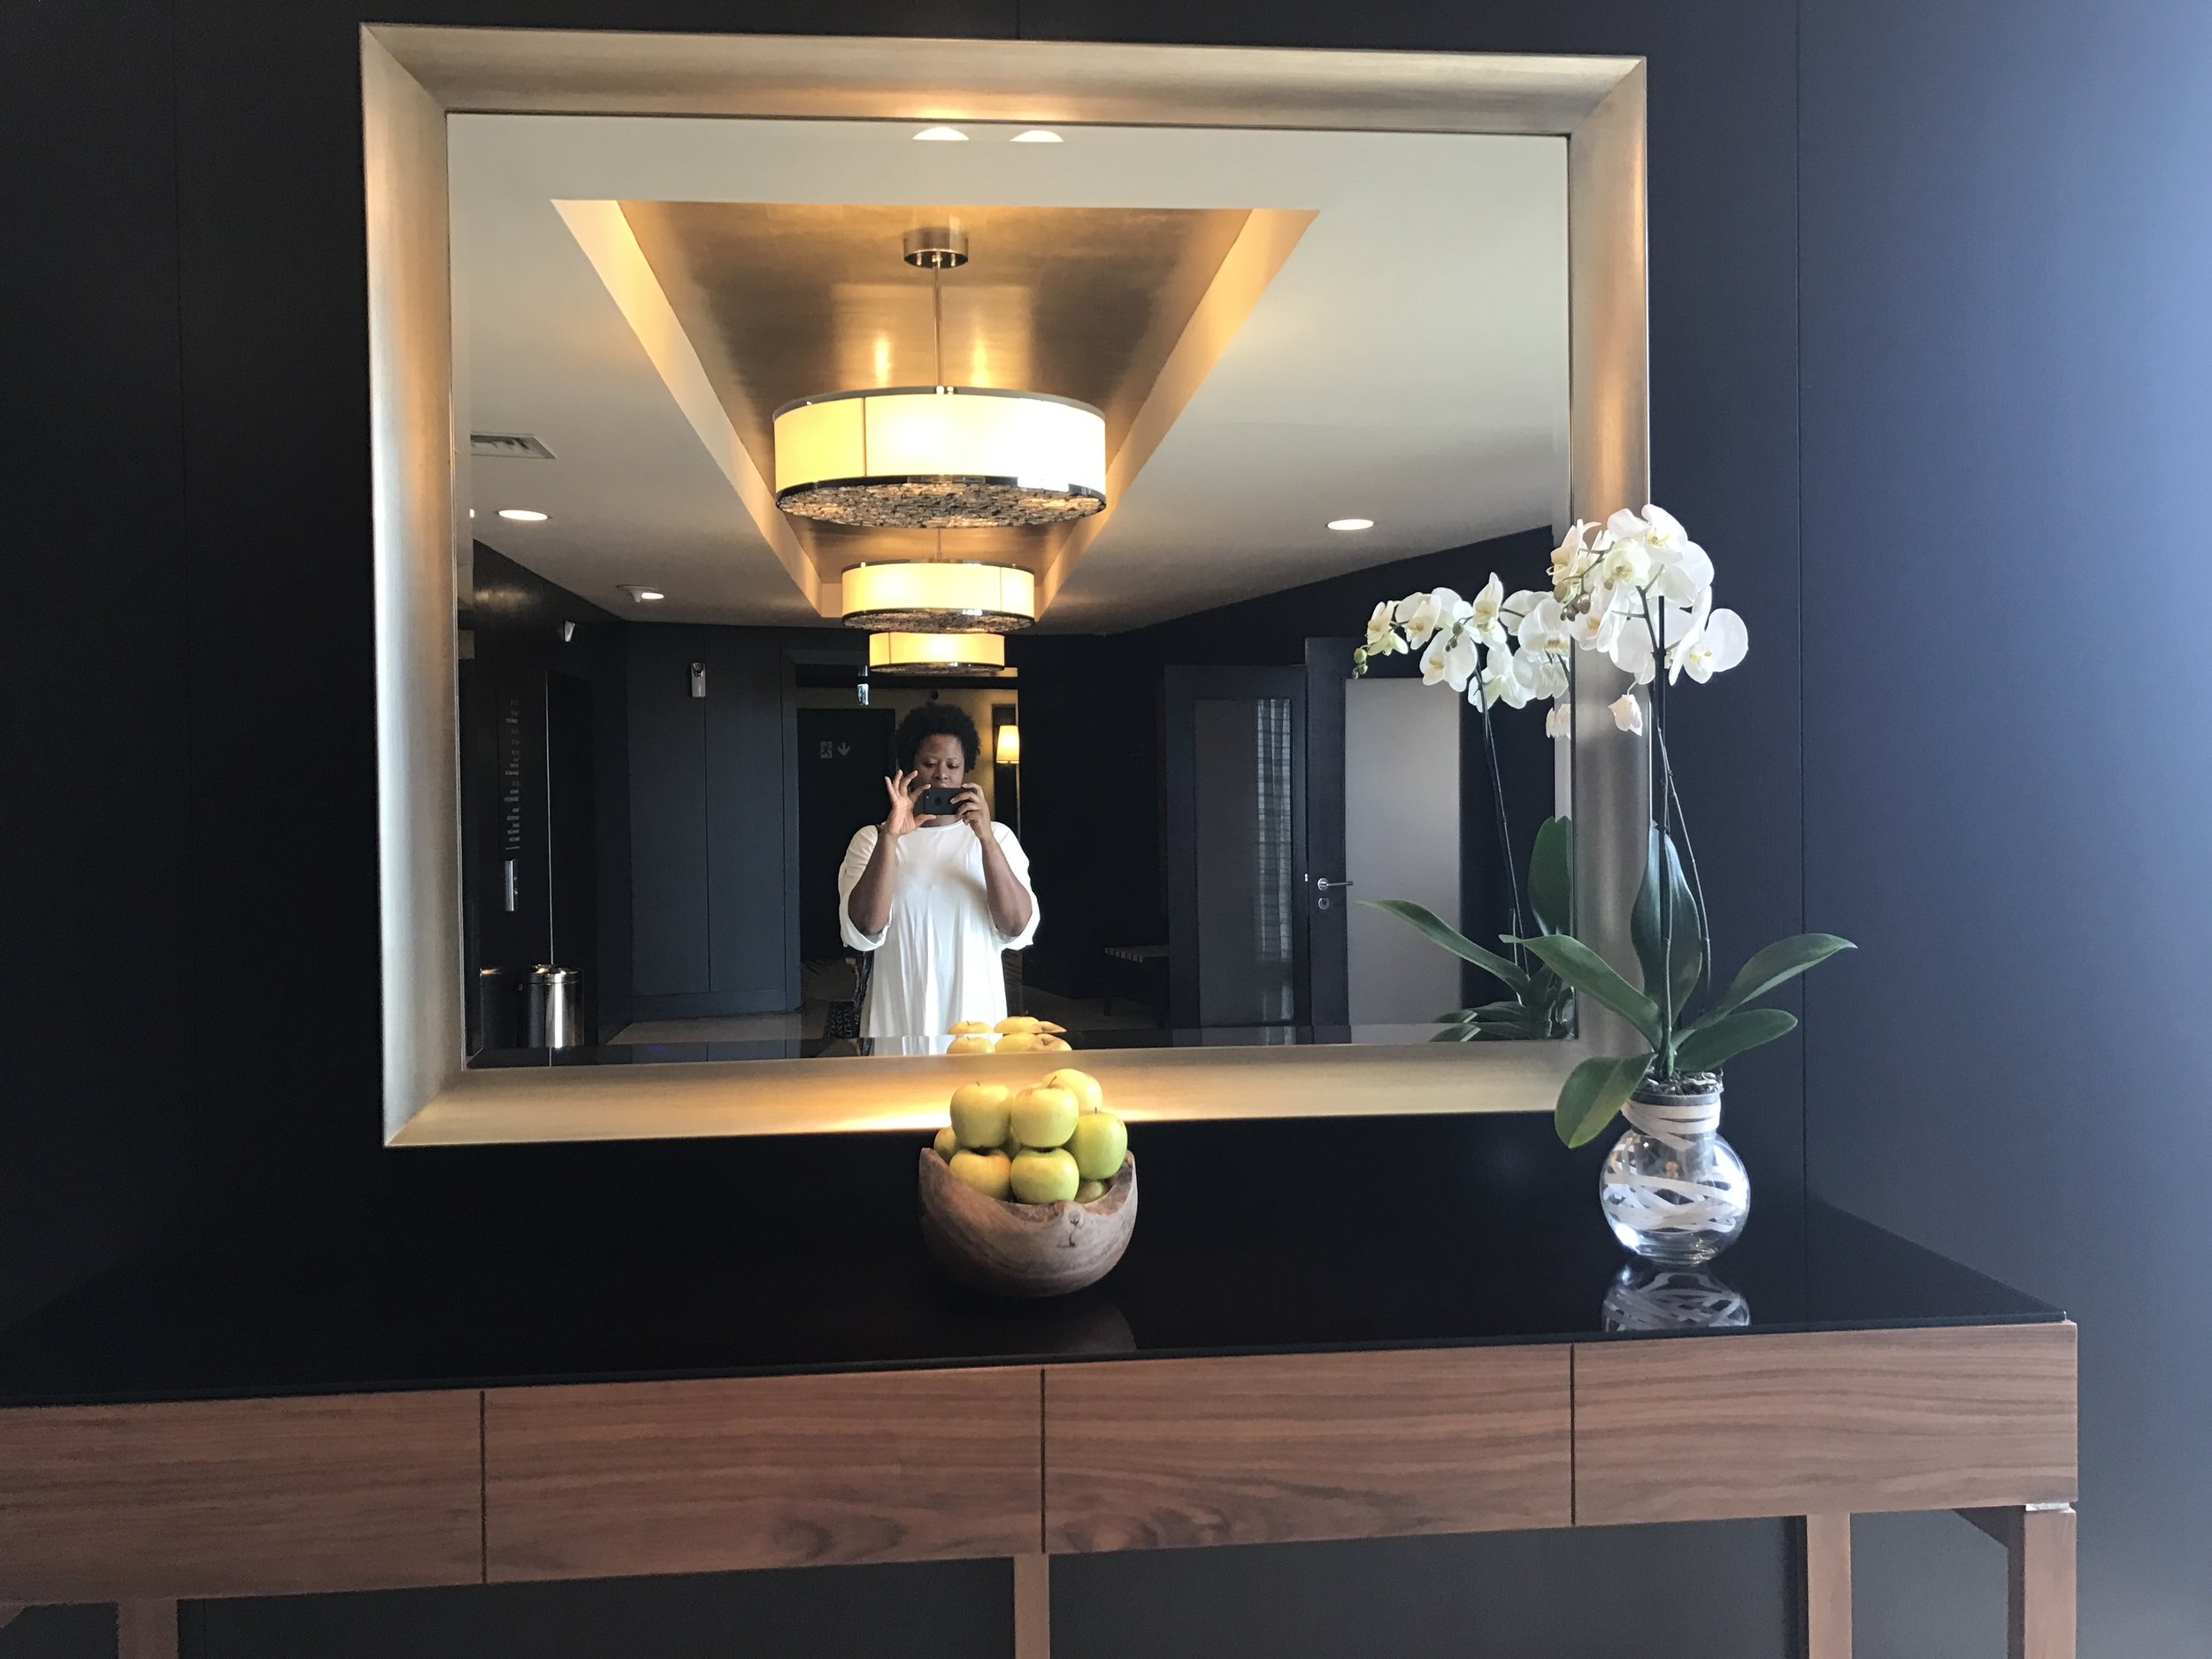 Kempinski-Goldcoast-Accra-Hotel-Review-Photos-vickieremoeofficial10.JPG